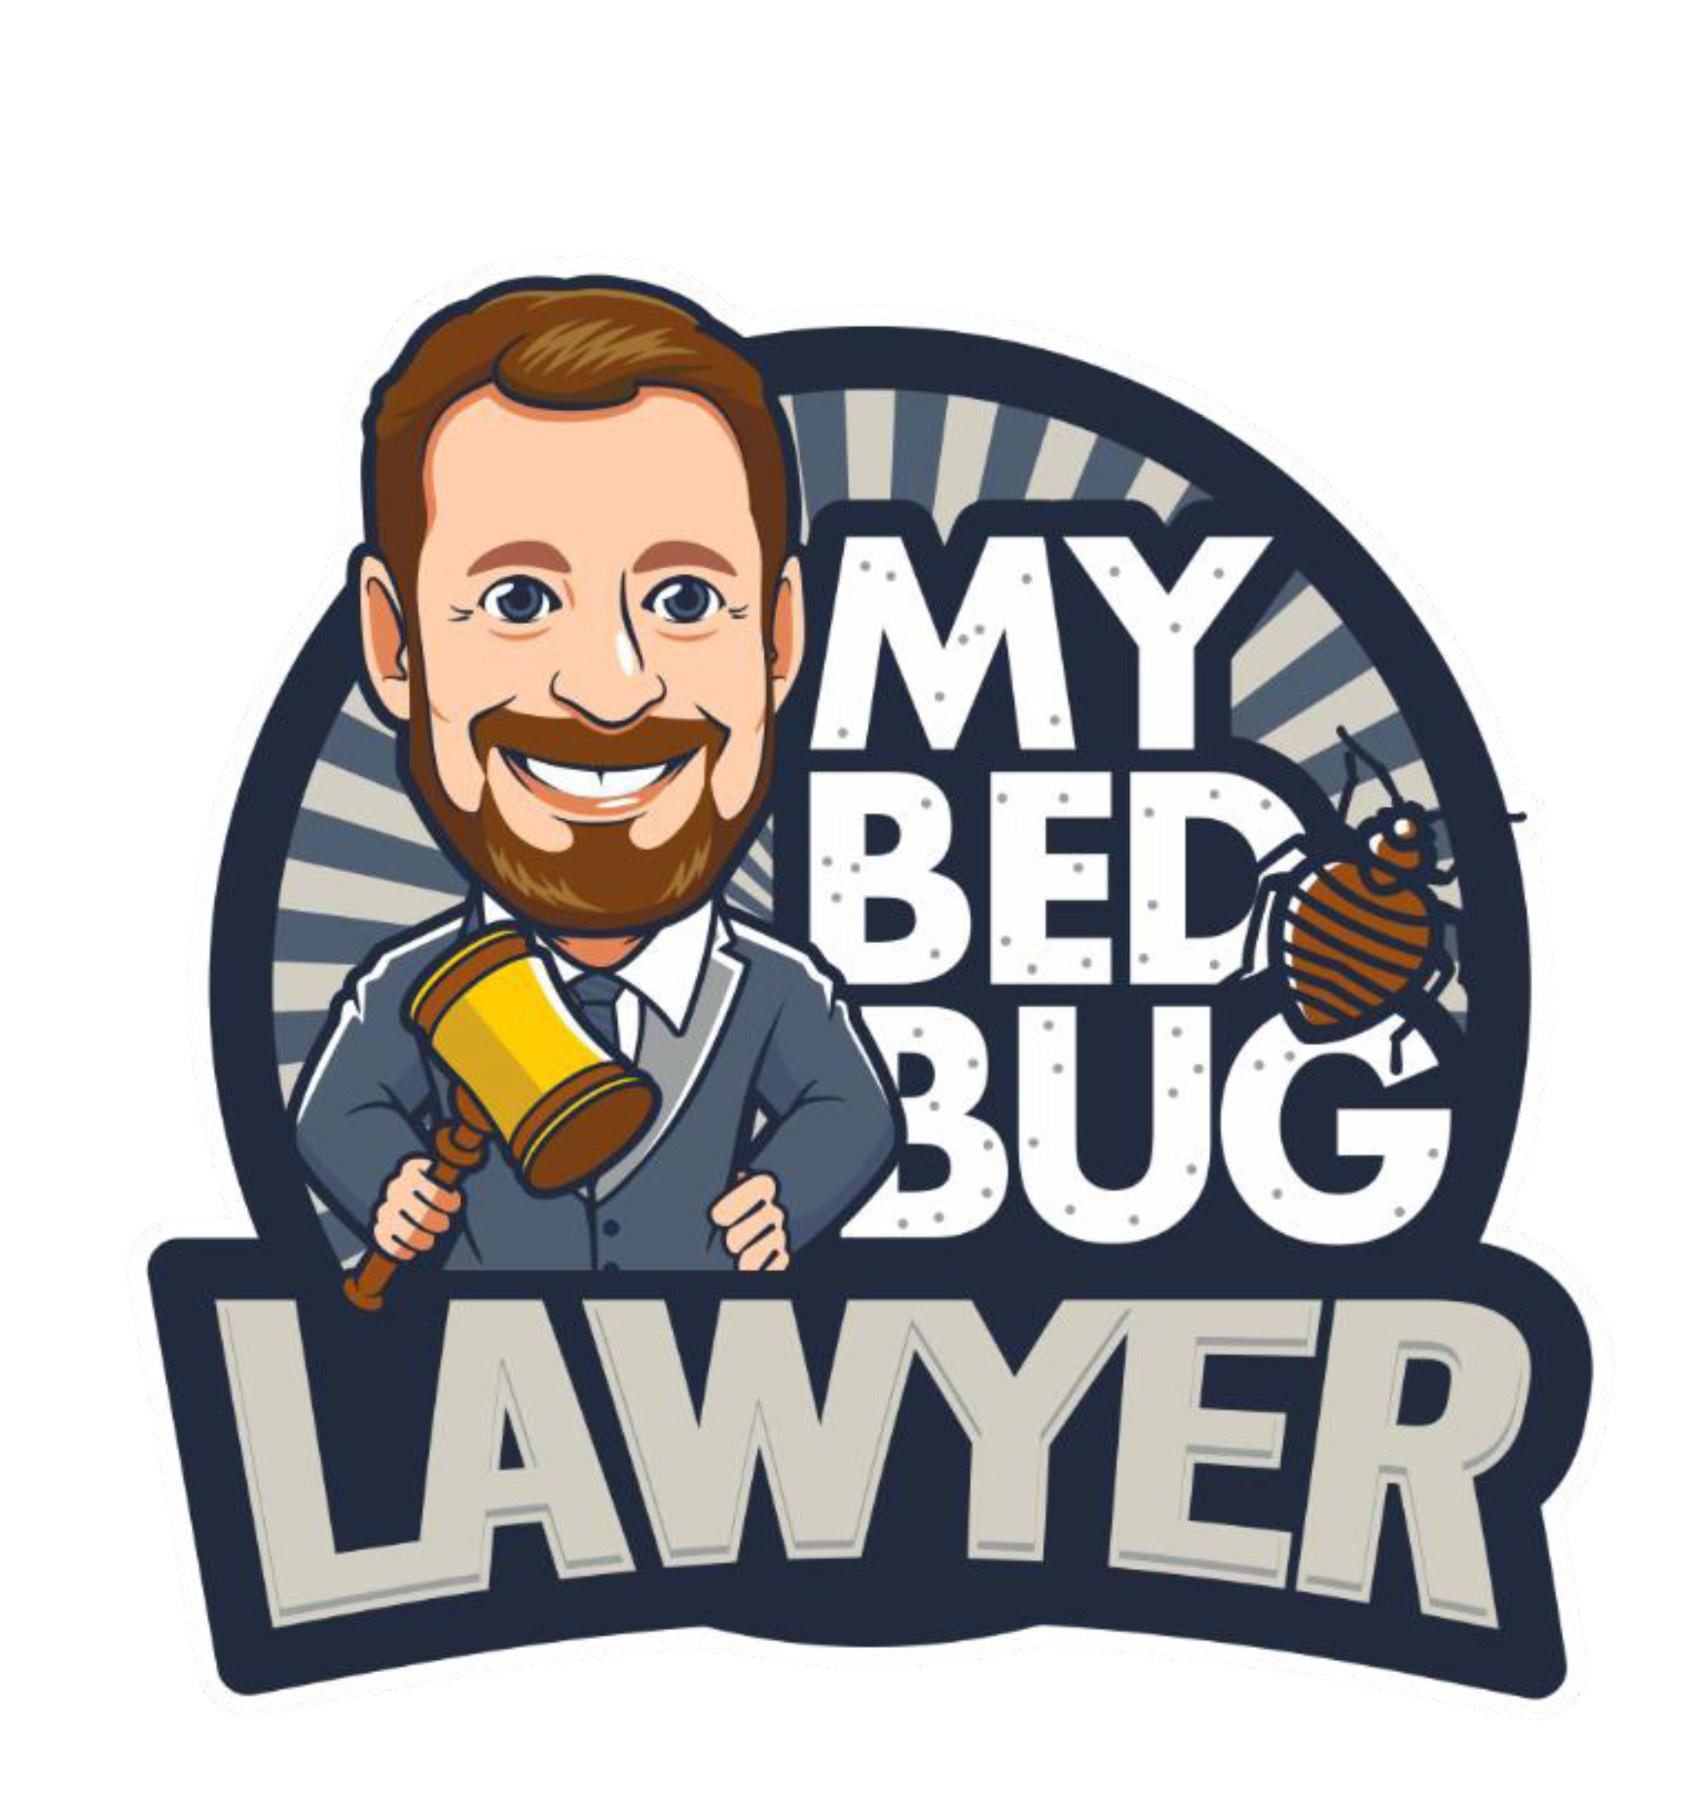 www.mybedbuglawyer.com (PRNewsfoto/MYBEDBUGLAWYER)